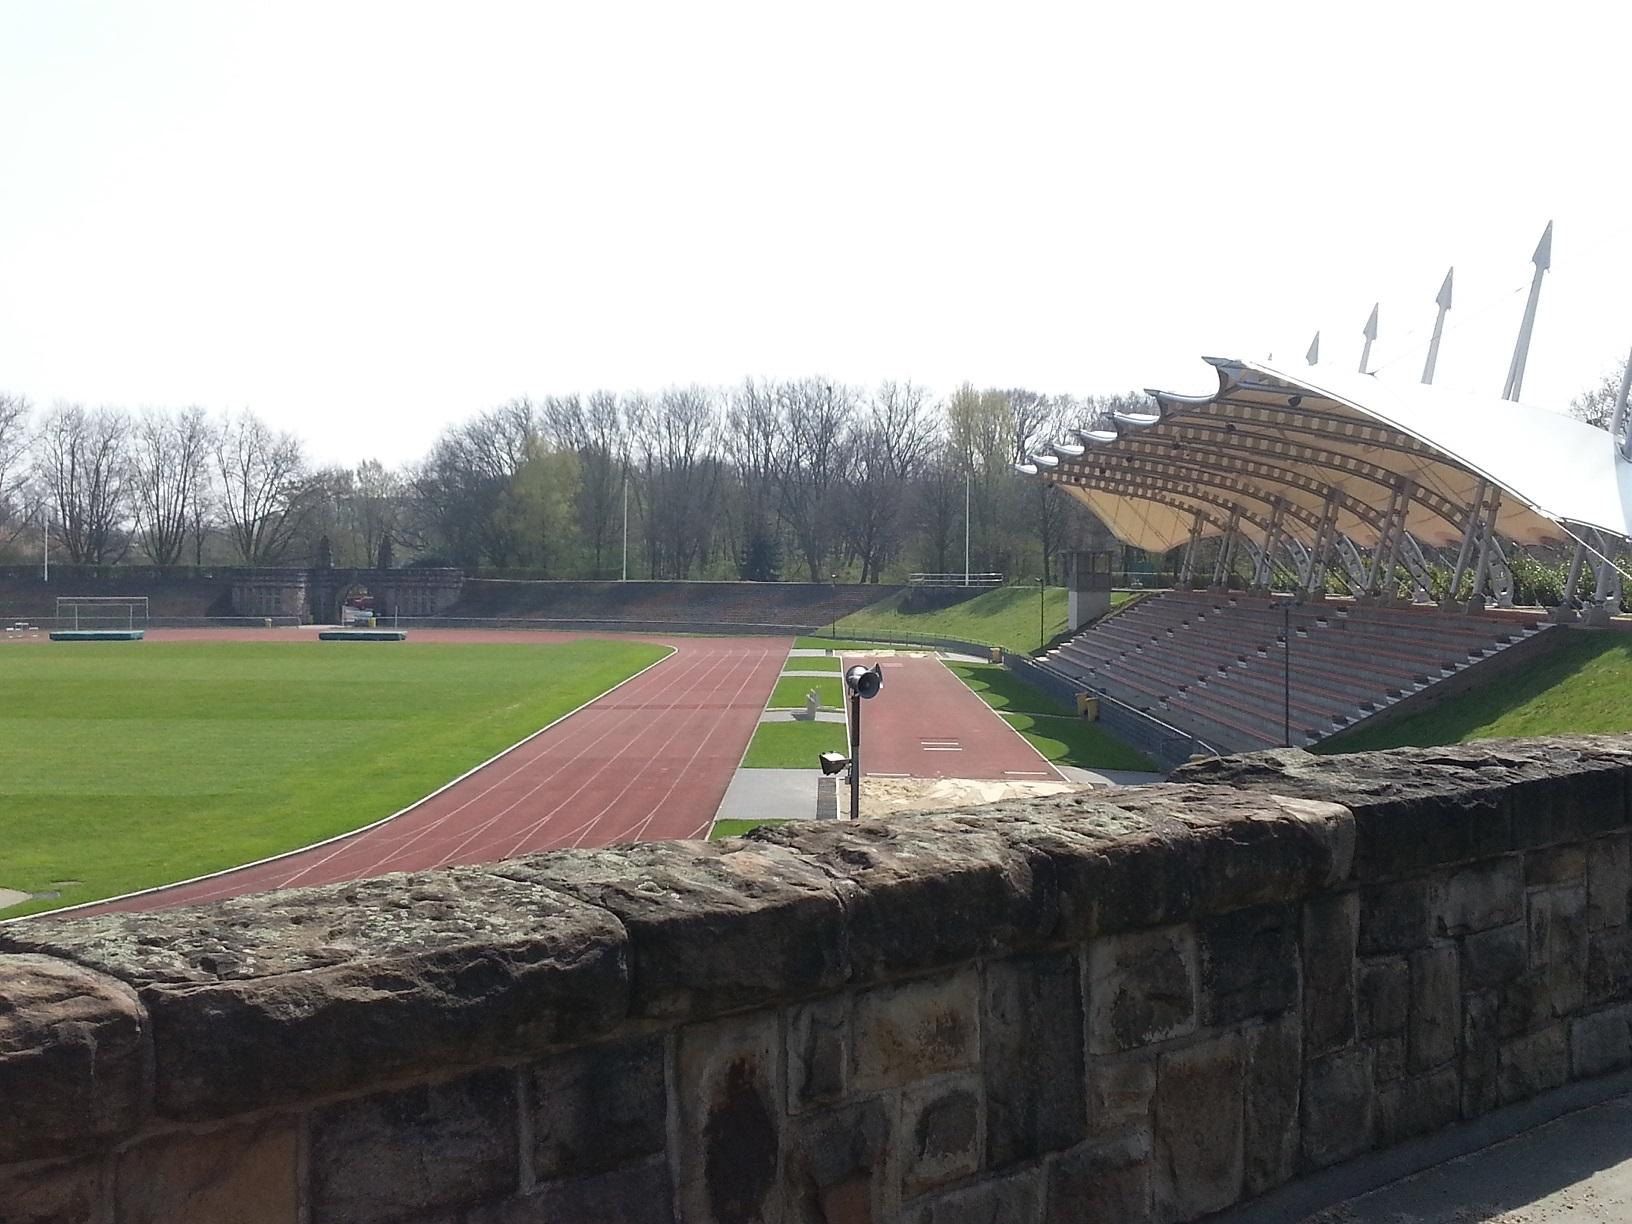 Stadion Gladbeck